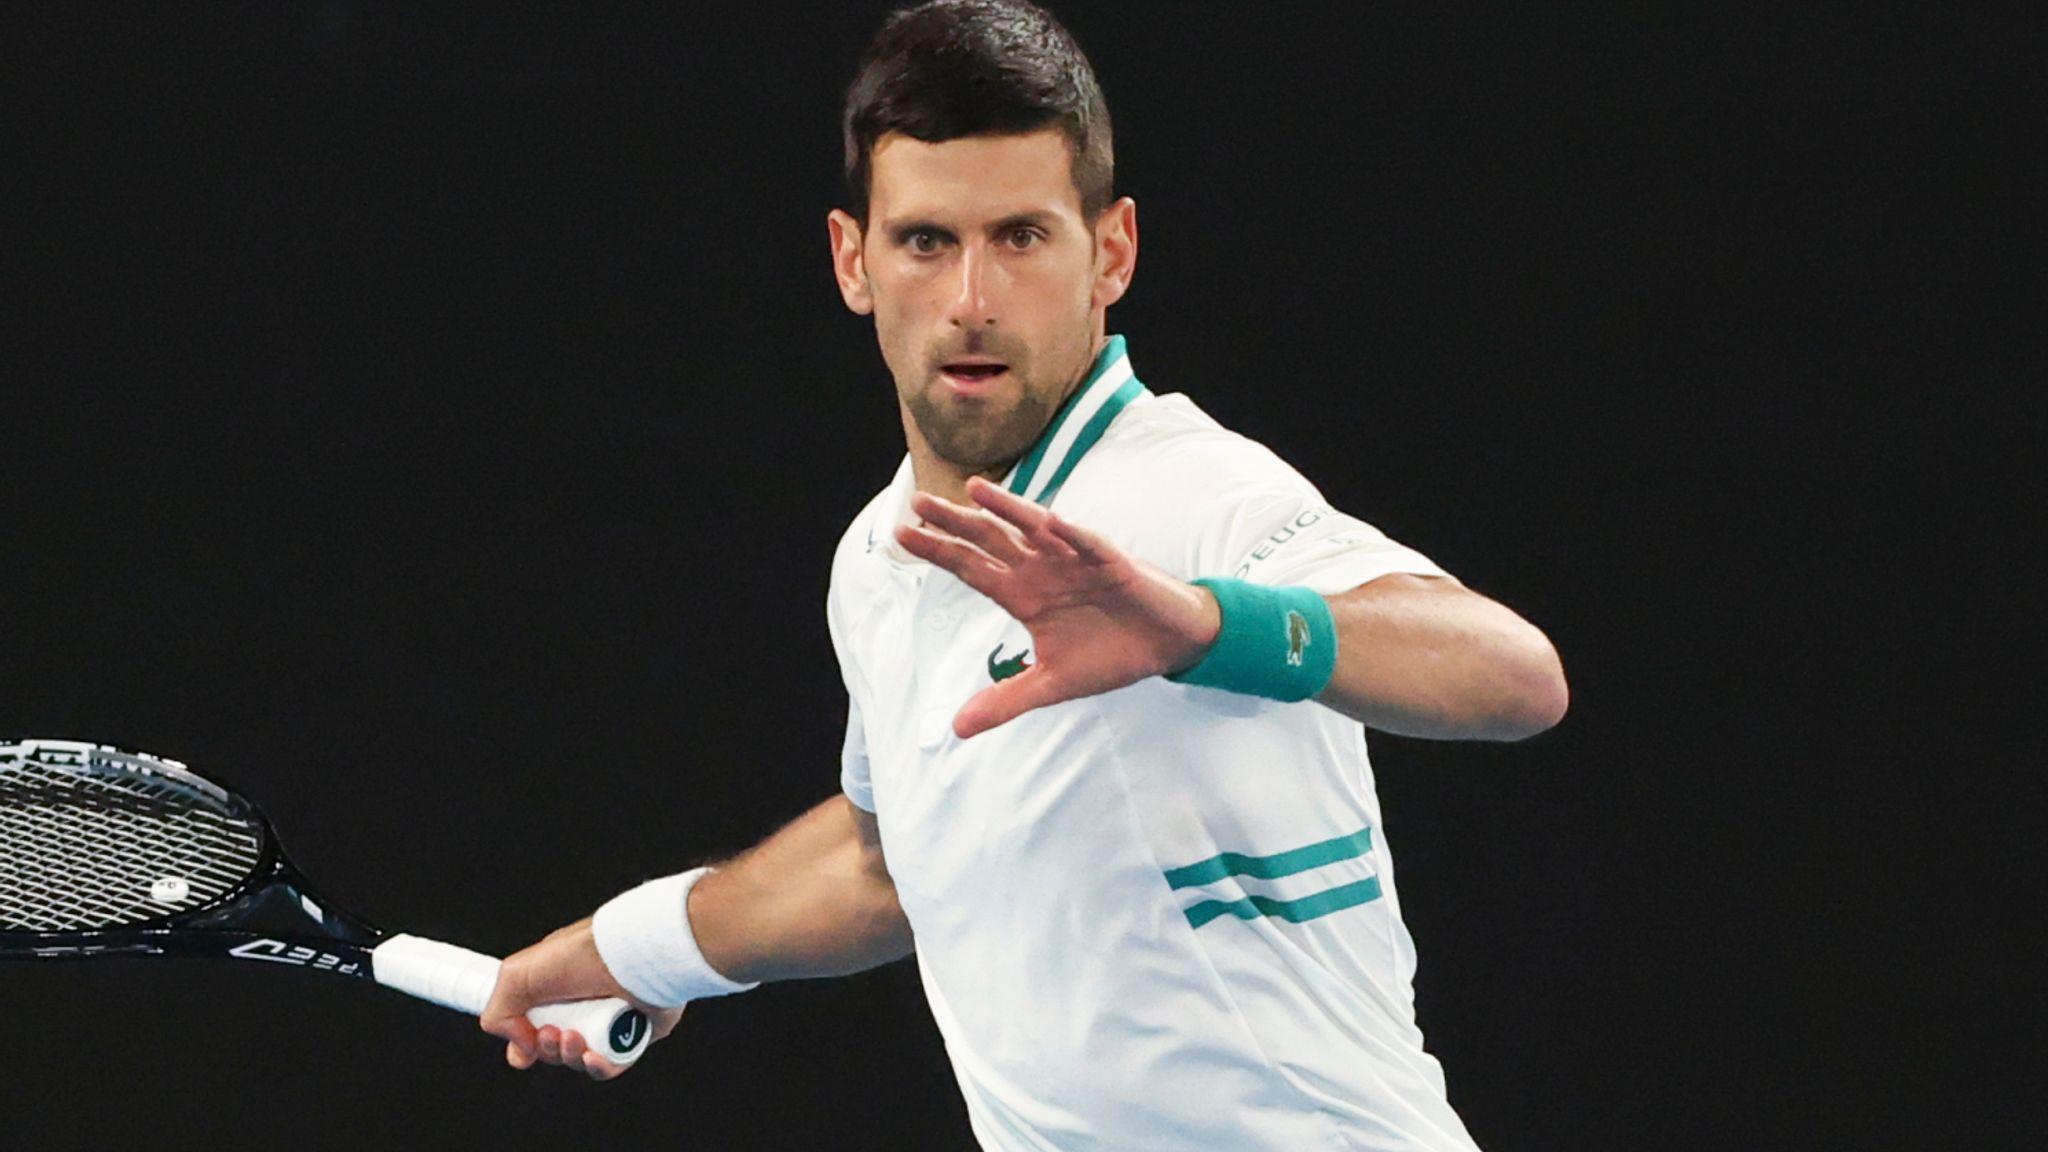 Australian Open: Novak Djokovic admits 'gamble' in continuing title defence  | Tennis News | Sky Sports